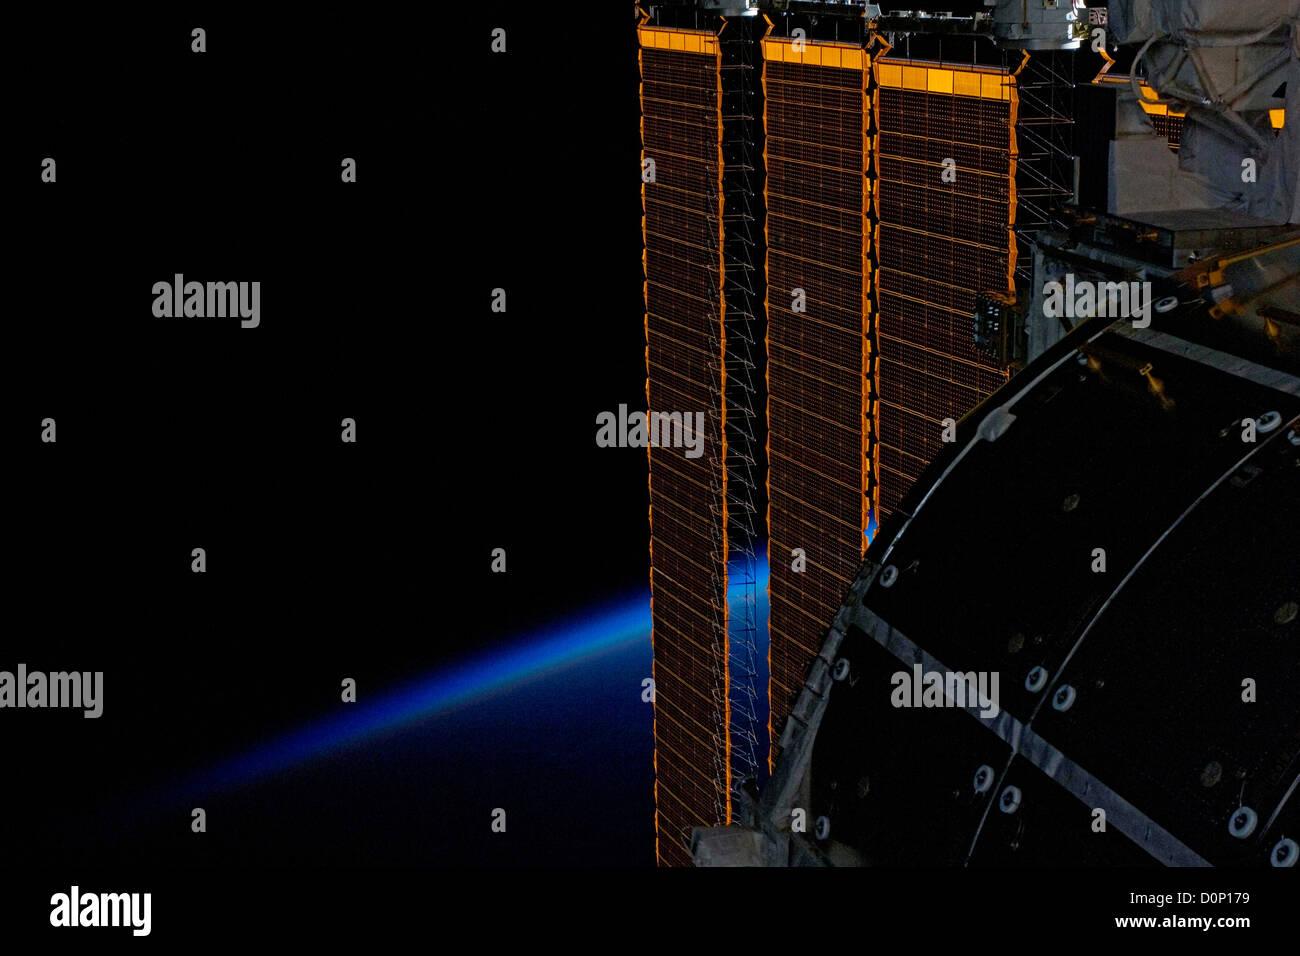 International Space Station's Solar Panels - Stock Image